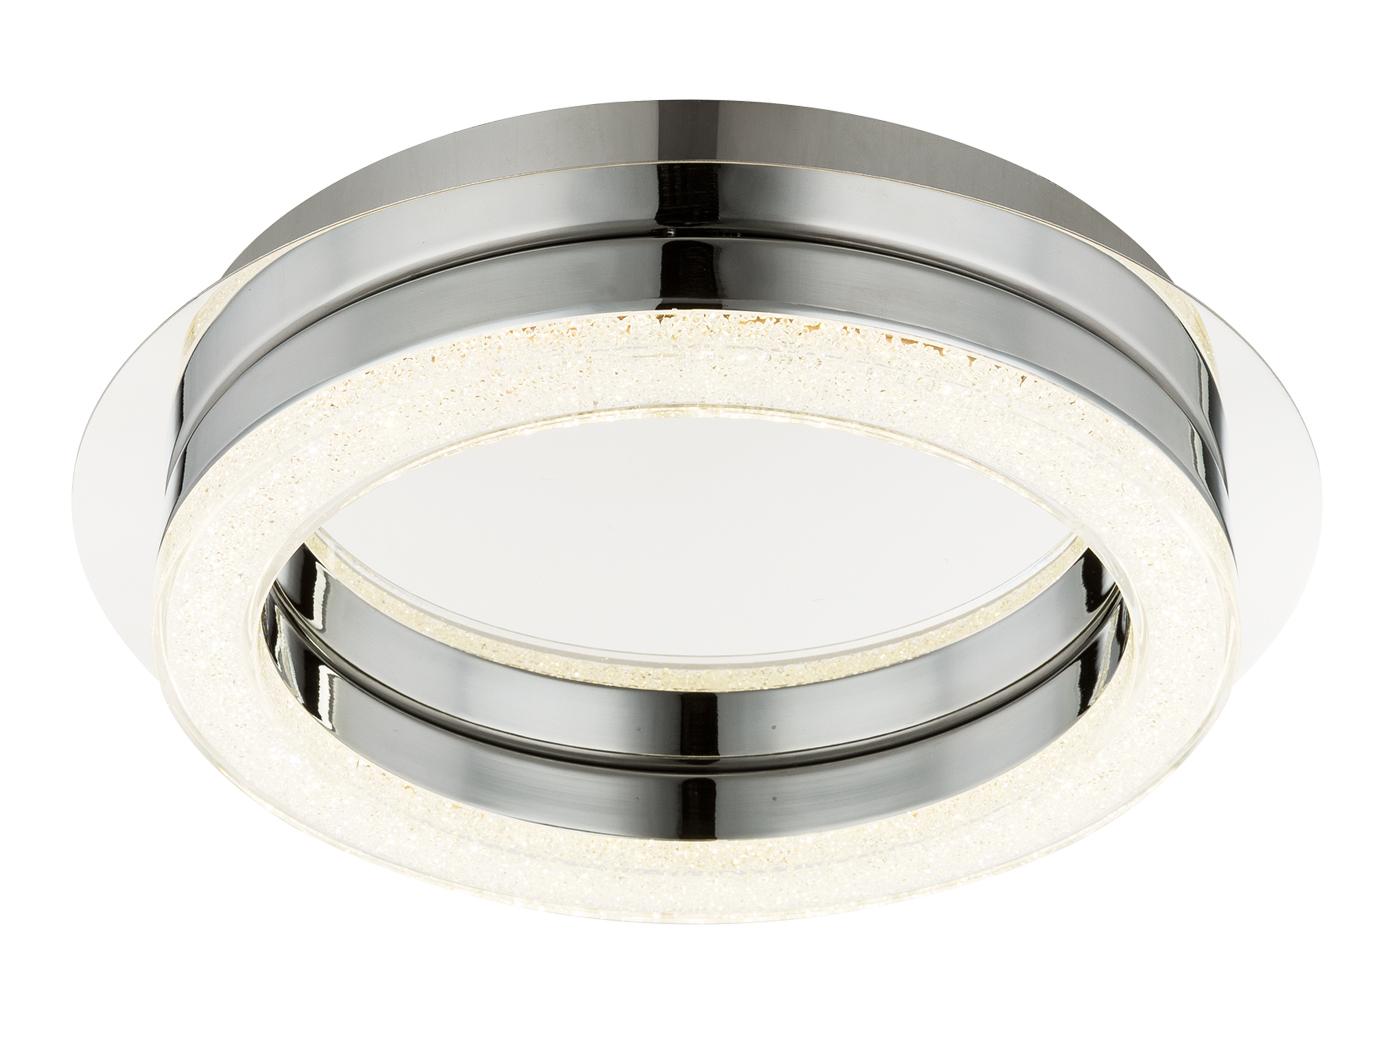 globo led deckenleuchte spikur deckenlampe rund chrom. Black Bedroom Furniture Sets. Home Design Ideas